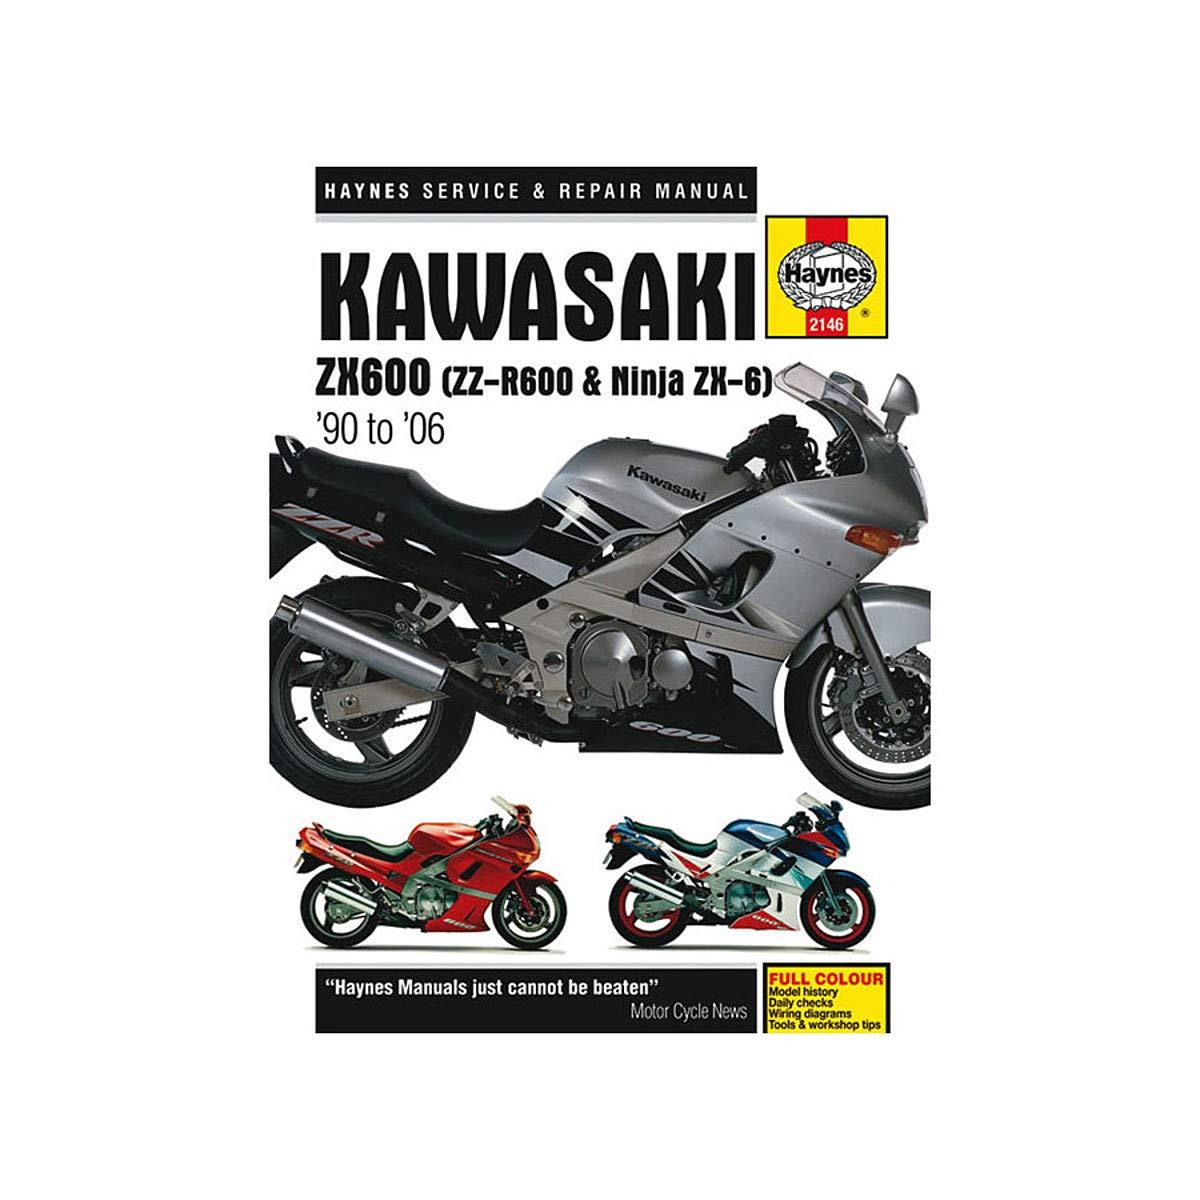 Haynes 91-94 Kawasaki ZX7R Repair Manual on onan parts diagrams, john deere electrical diagrams, mercury outboard 115 hp diagrams, kawasaki trains, kawasaki carburetor diagram, kawasaki 110 atv, kawasaki bayou 220 wiring,